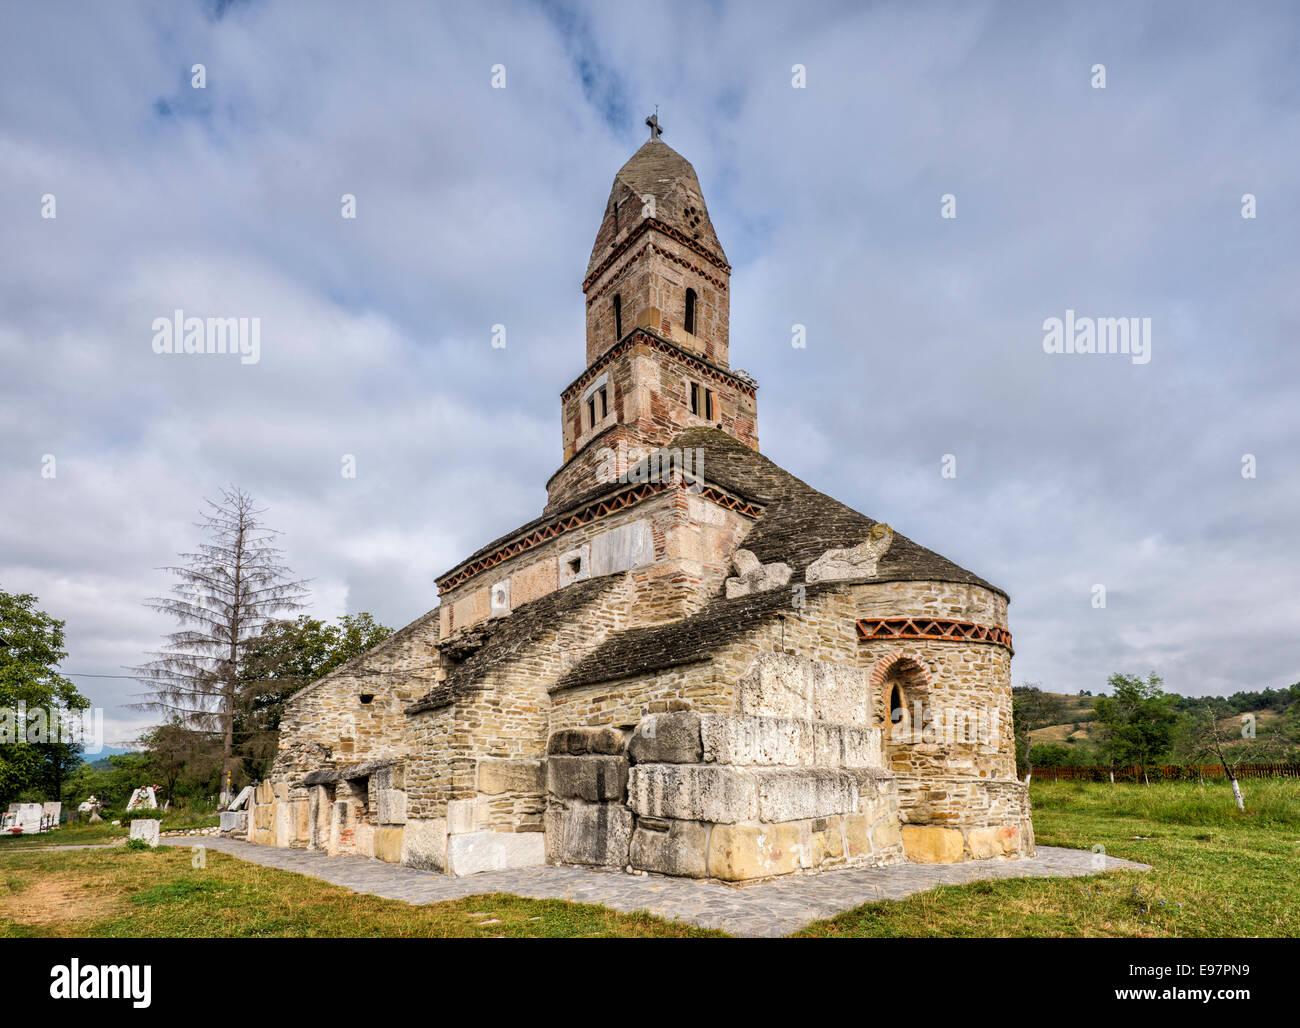 Biserica Sf Nicolae, medieval Orthodox Church of St Nicholas, 7th century, in village of Densus, Transylvania, Romania - Stock Image